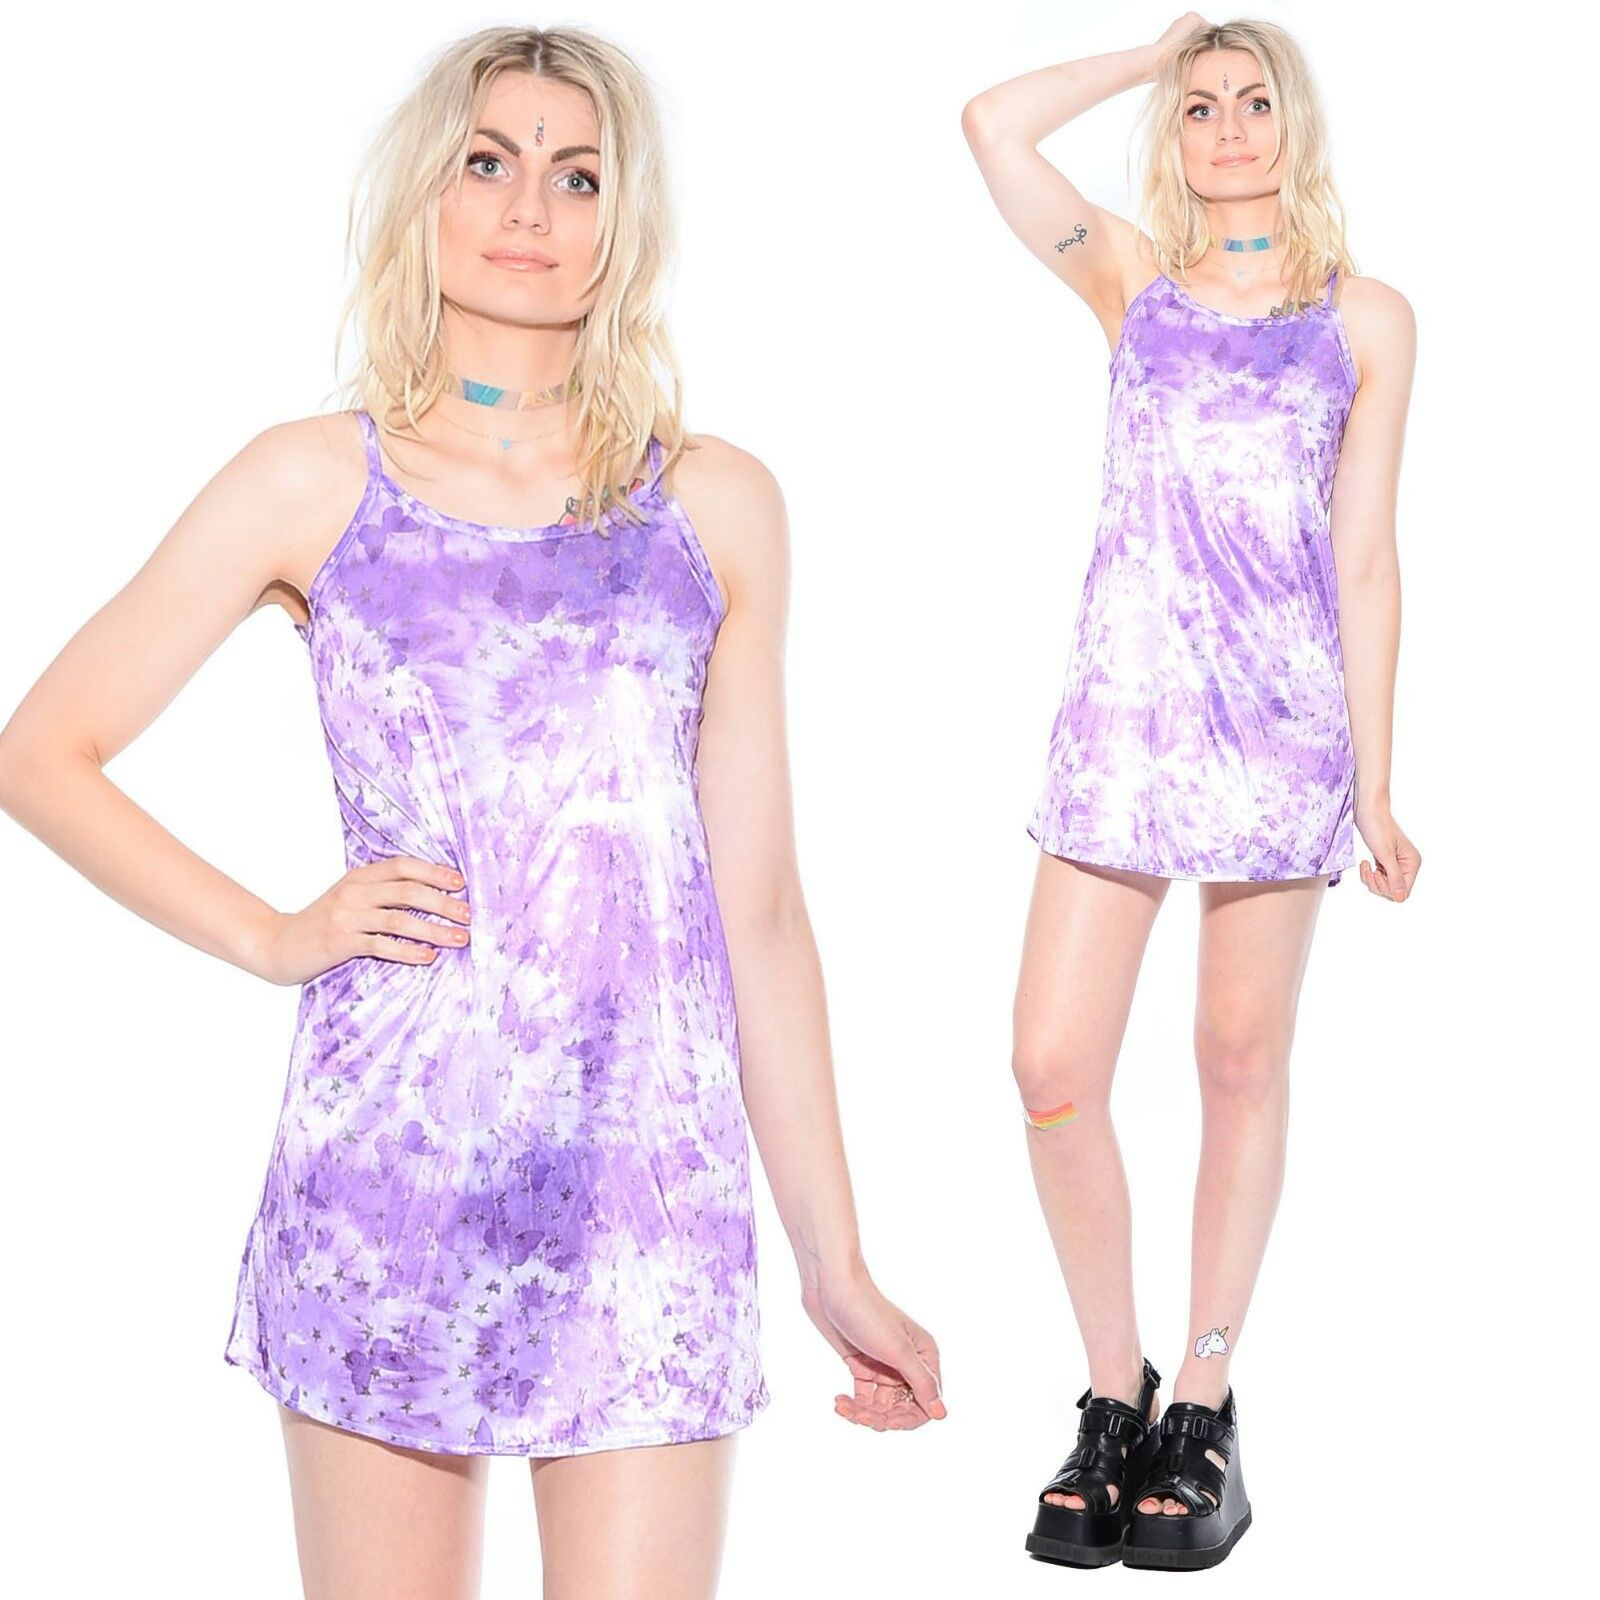 Vtg 90s HOLOGRAPHIC Metallic Butterfly Club-Kid Rave Cyber Shiny Mini Dress S